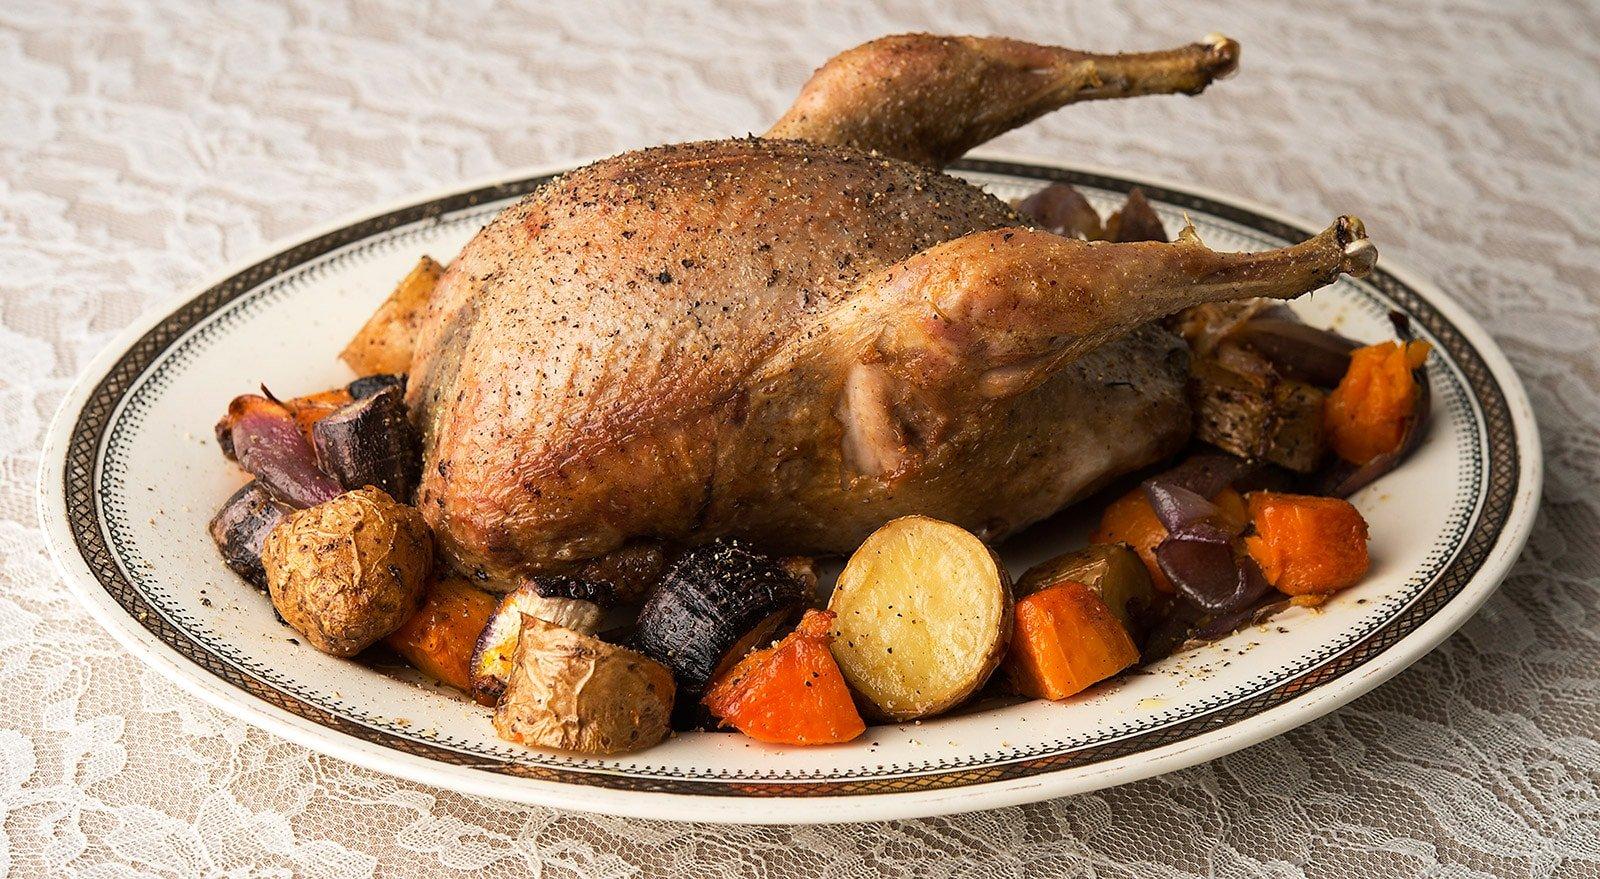 Roast sharp-tailed grouse